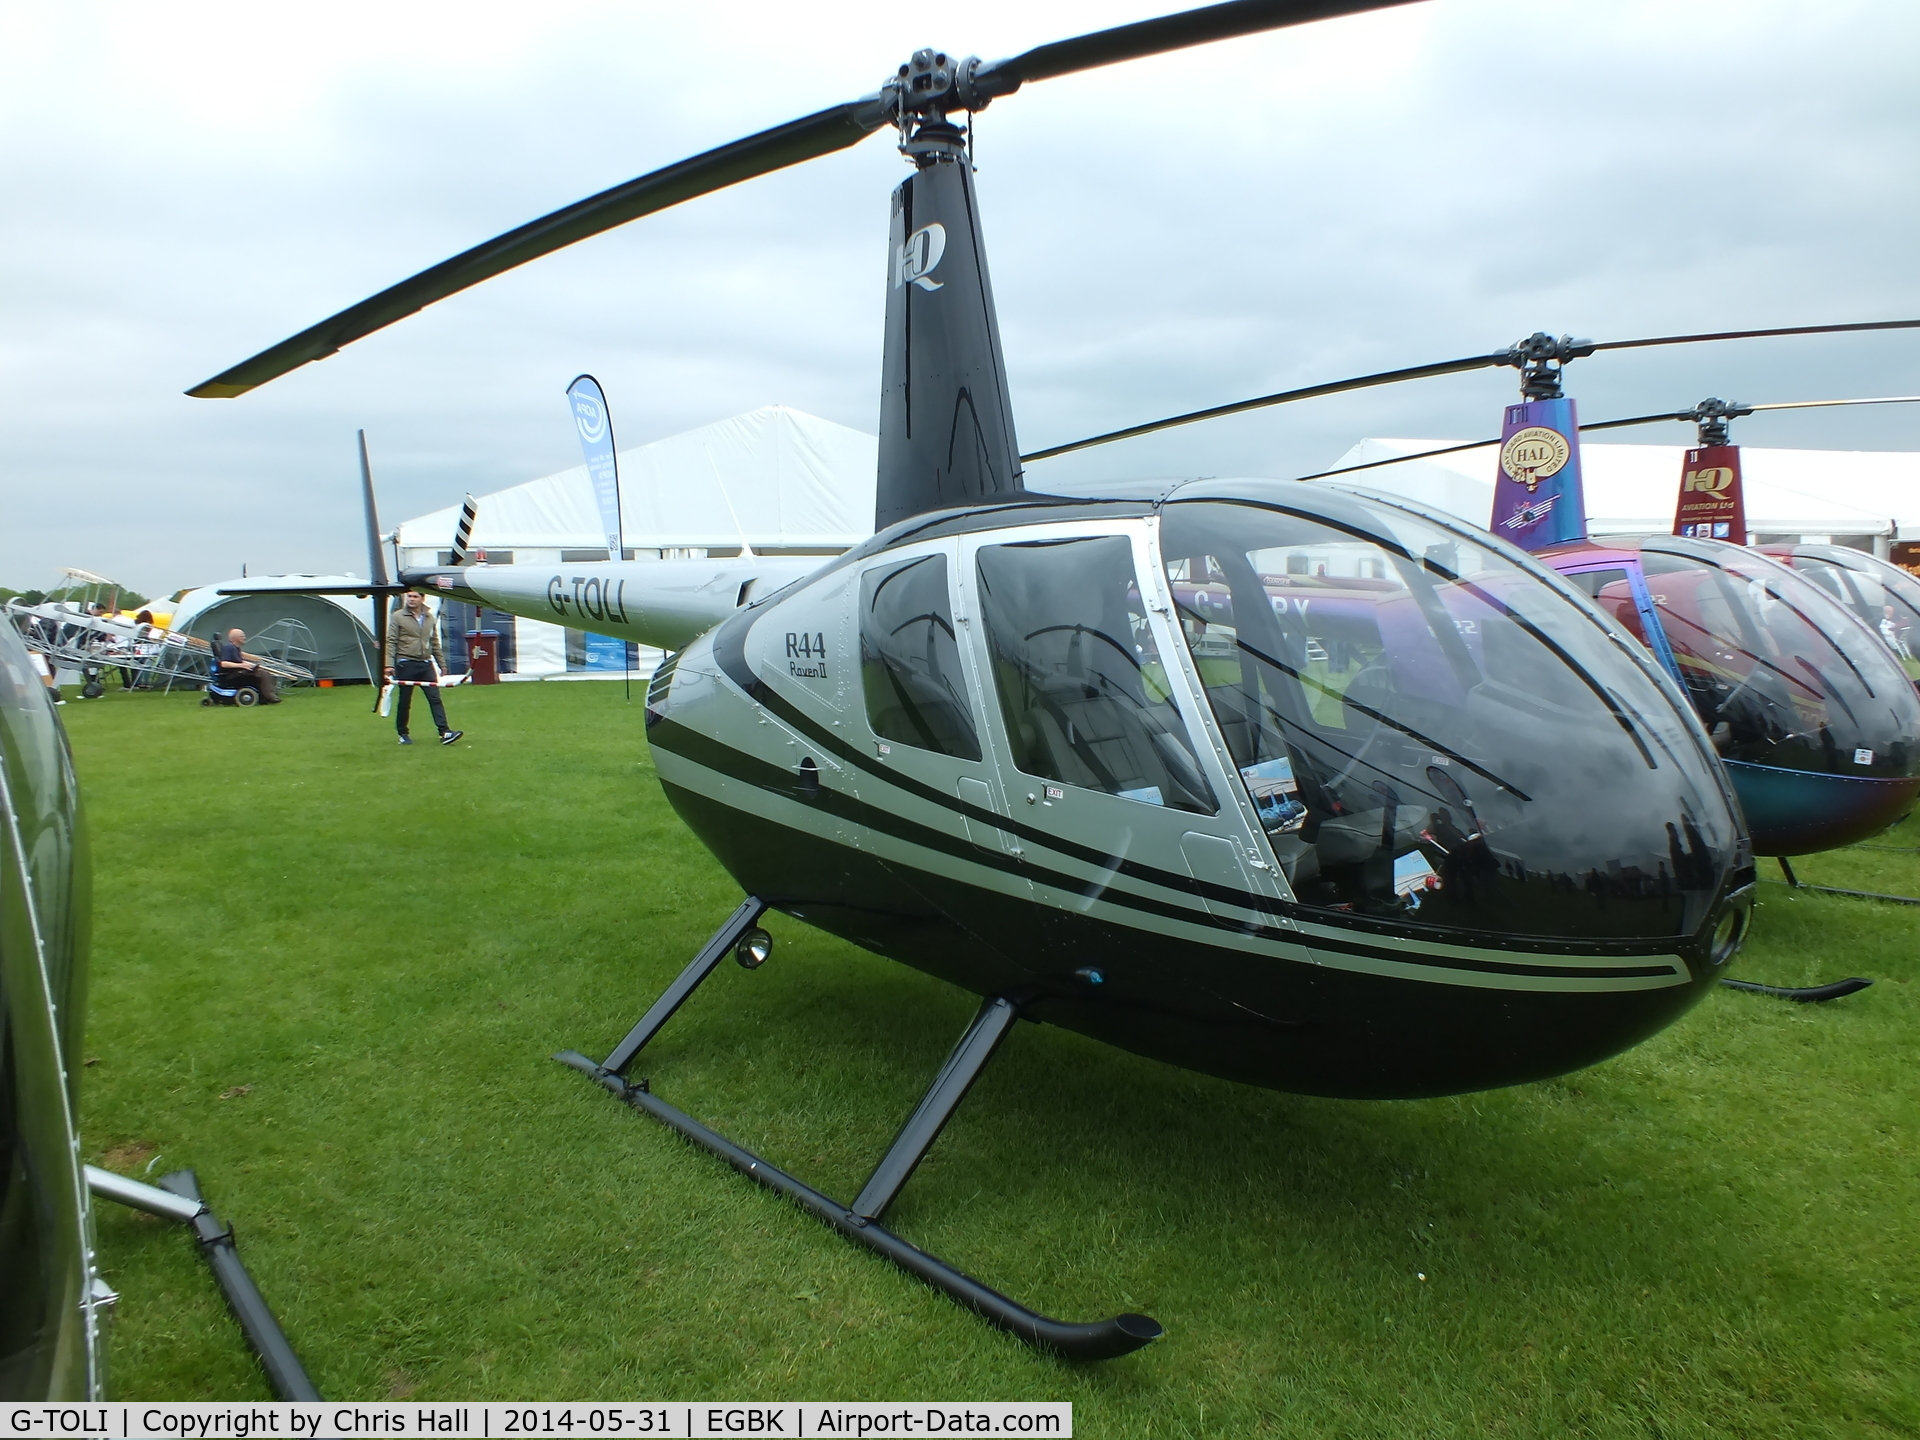 G-TOLI, 2007 Robinson R44 Raven II C/N 12009, at AeroExpo 2014